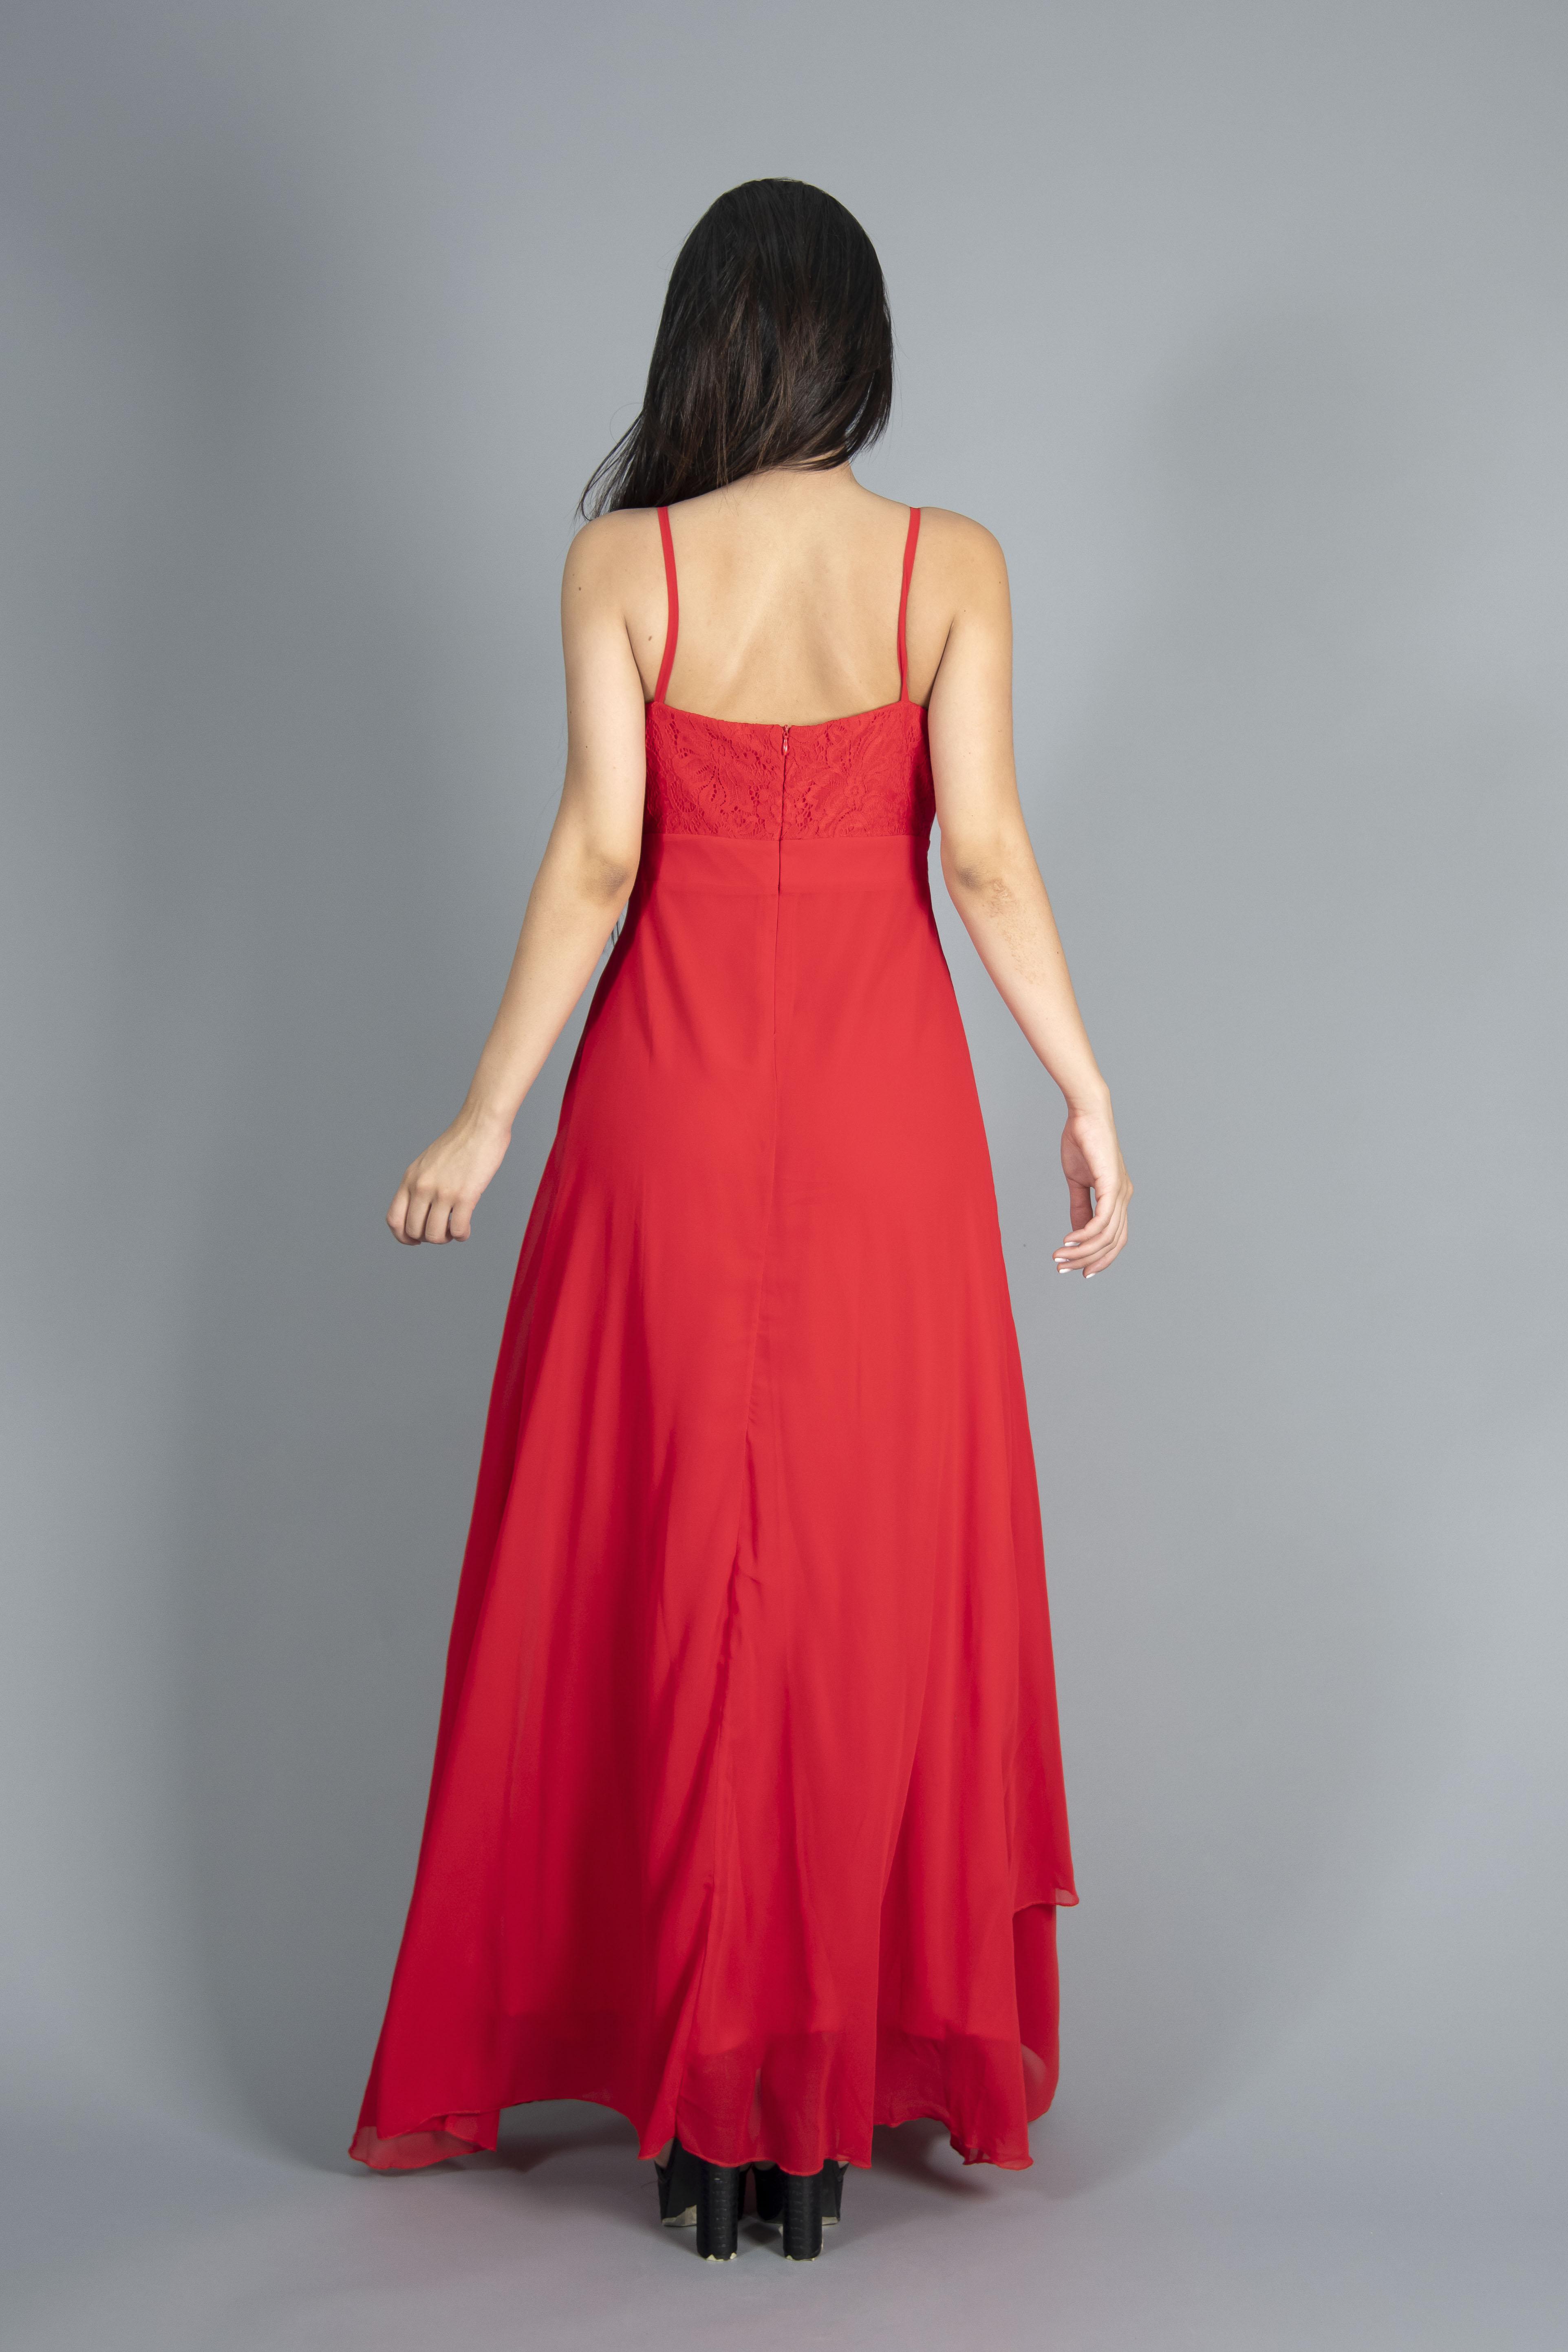 Vestido Rafaella (tallas XL - 4XL)